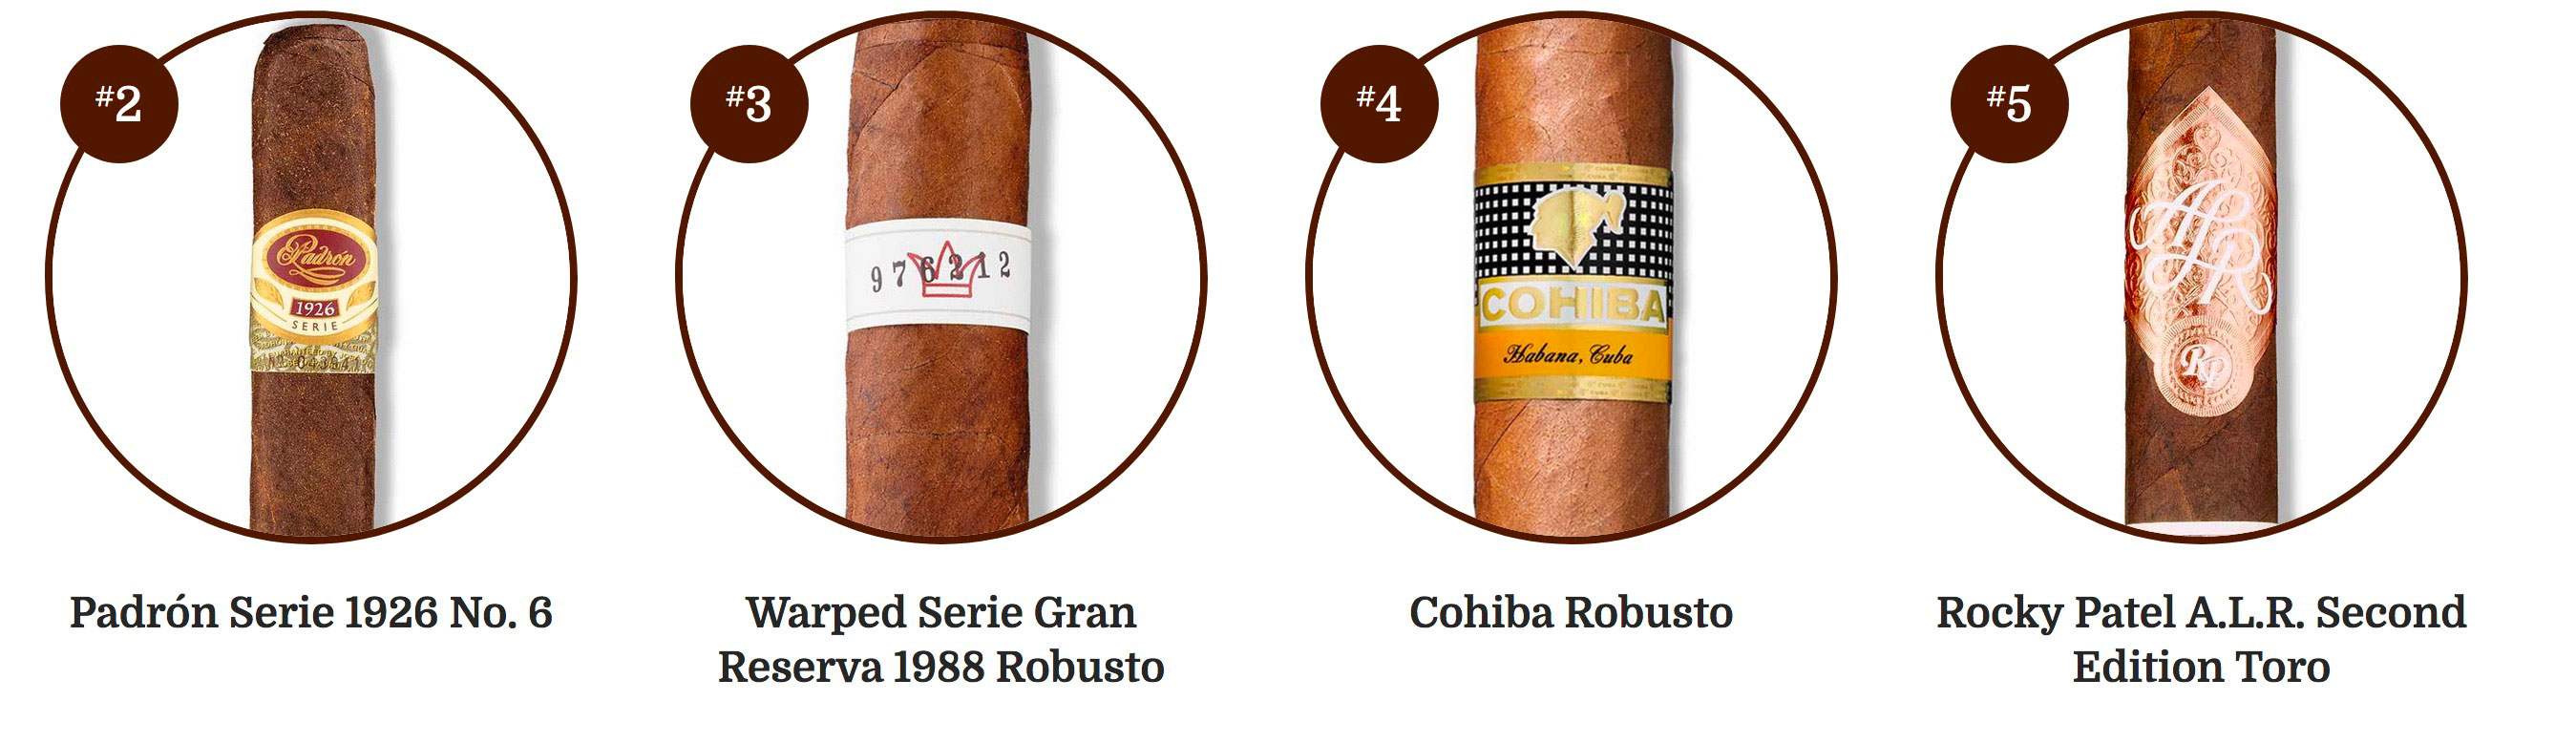 cigare cohiba esplendidos ciggar aficionado 2014